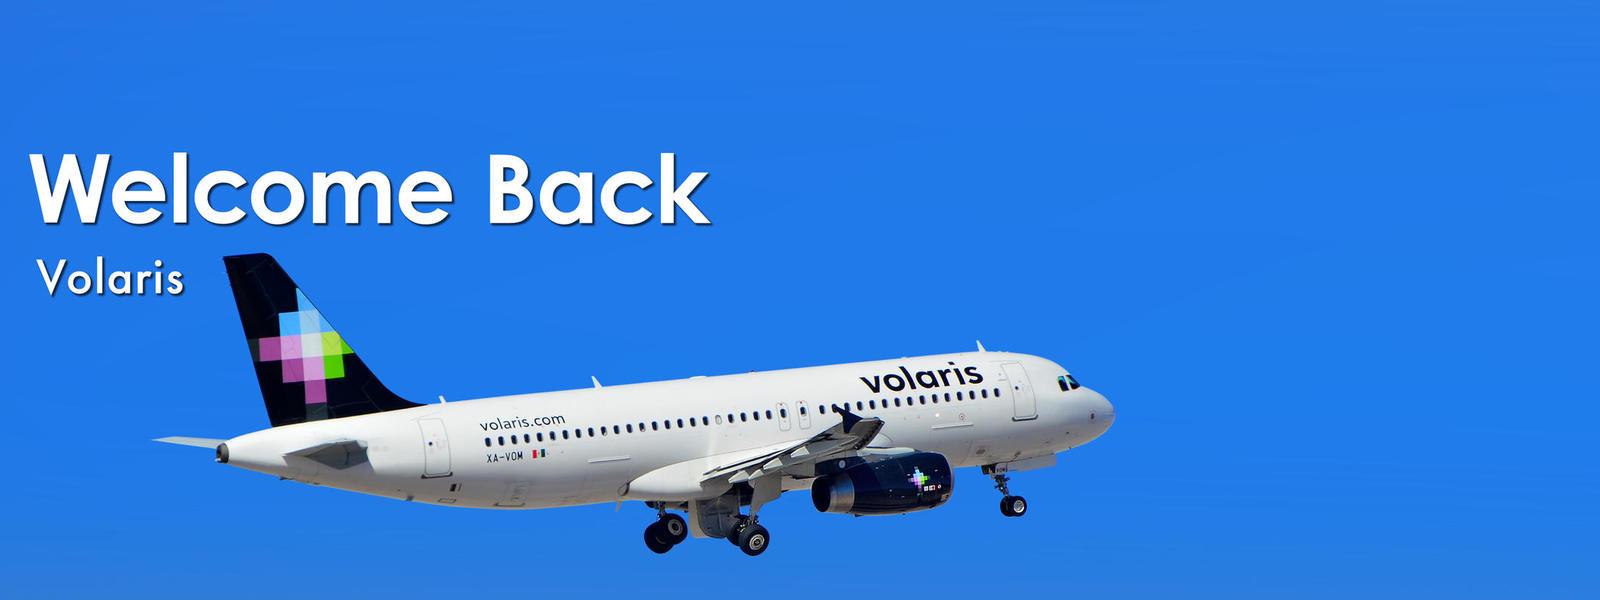 Welcome back Volaris